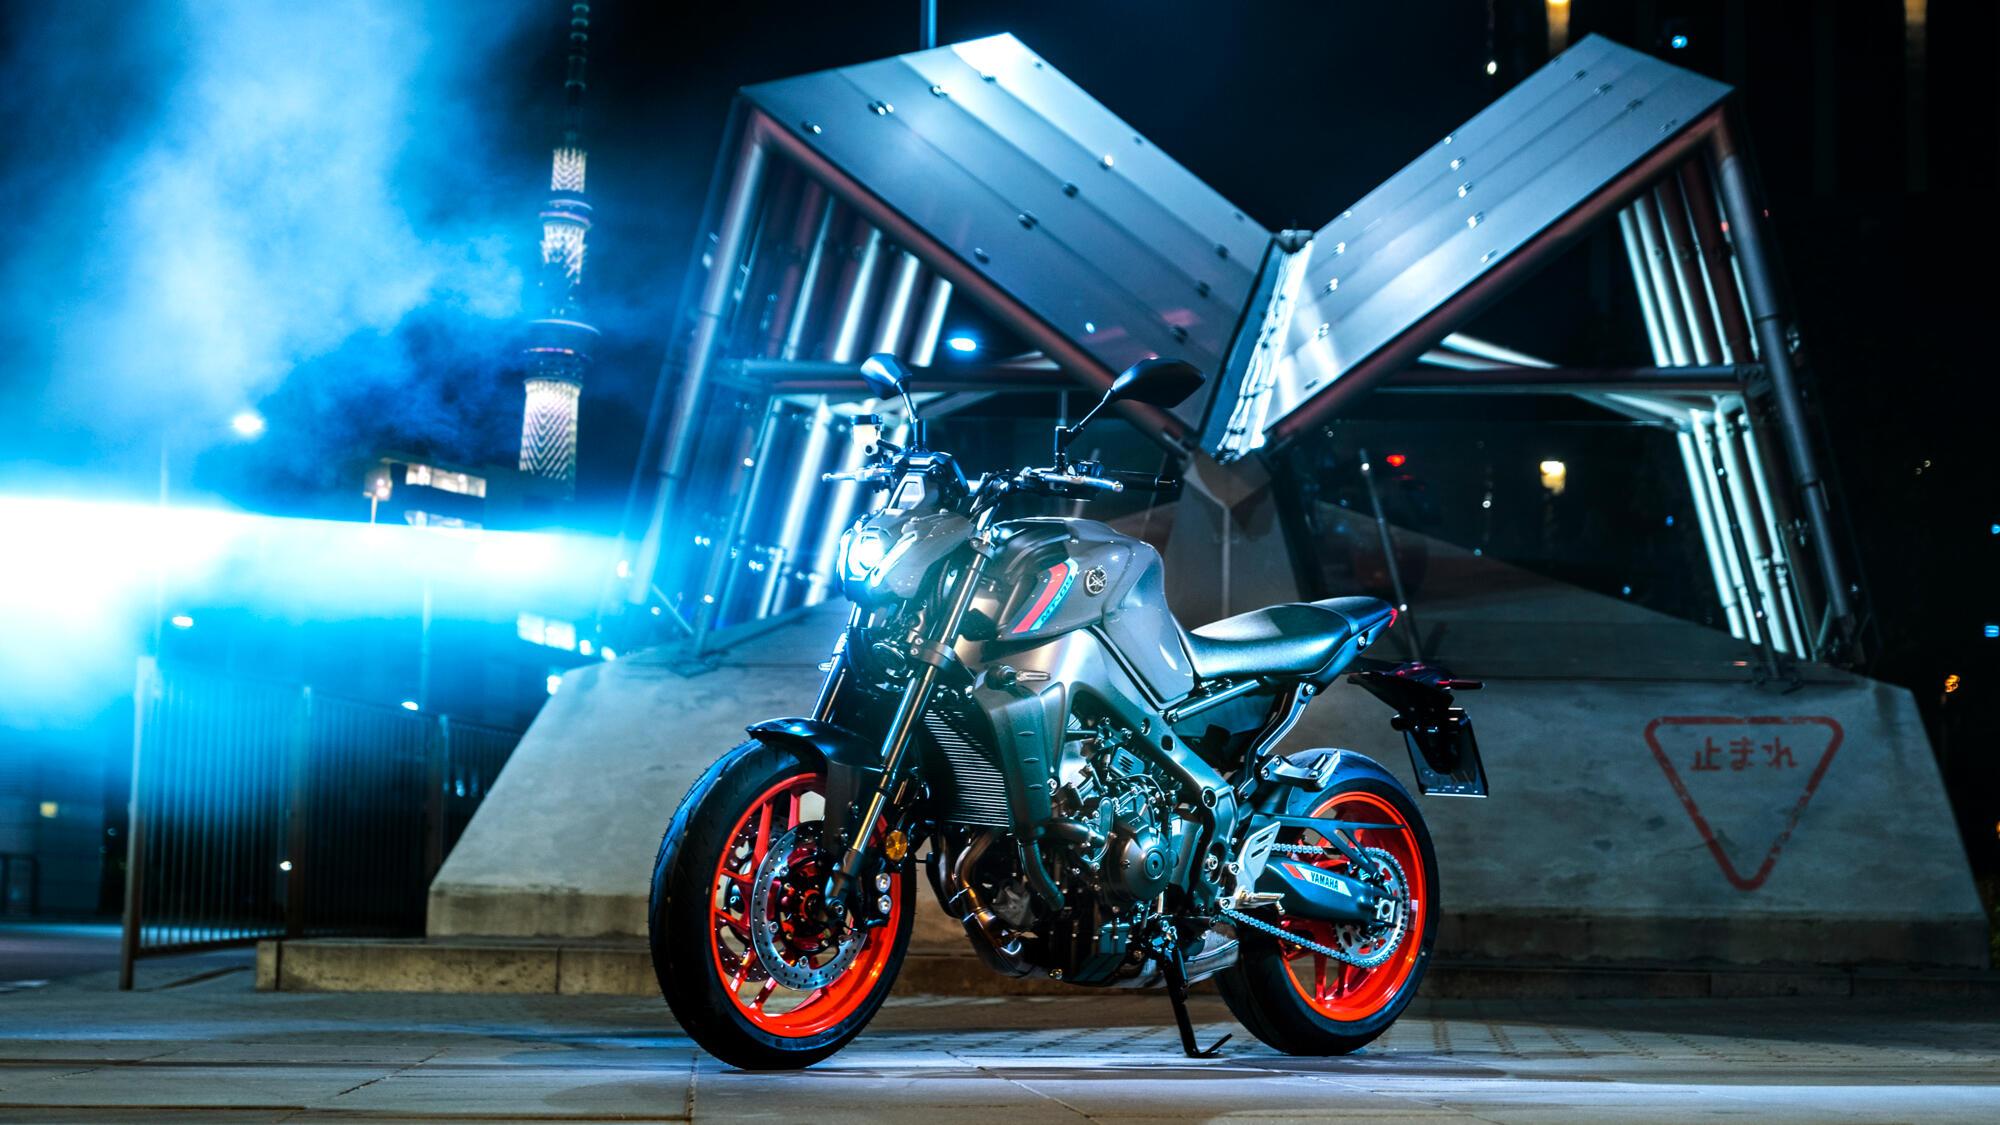 2021-Yamaha-MT09-EU-Storm_Fluo-Static-005-03